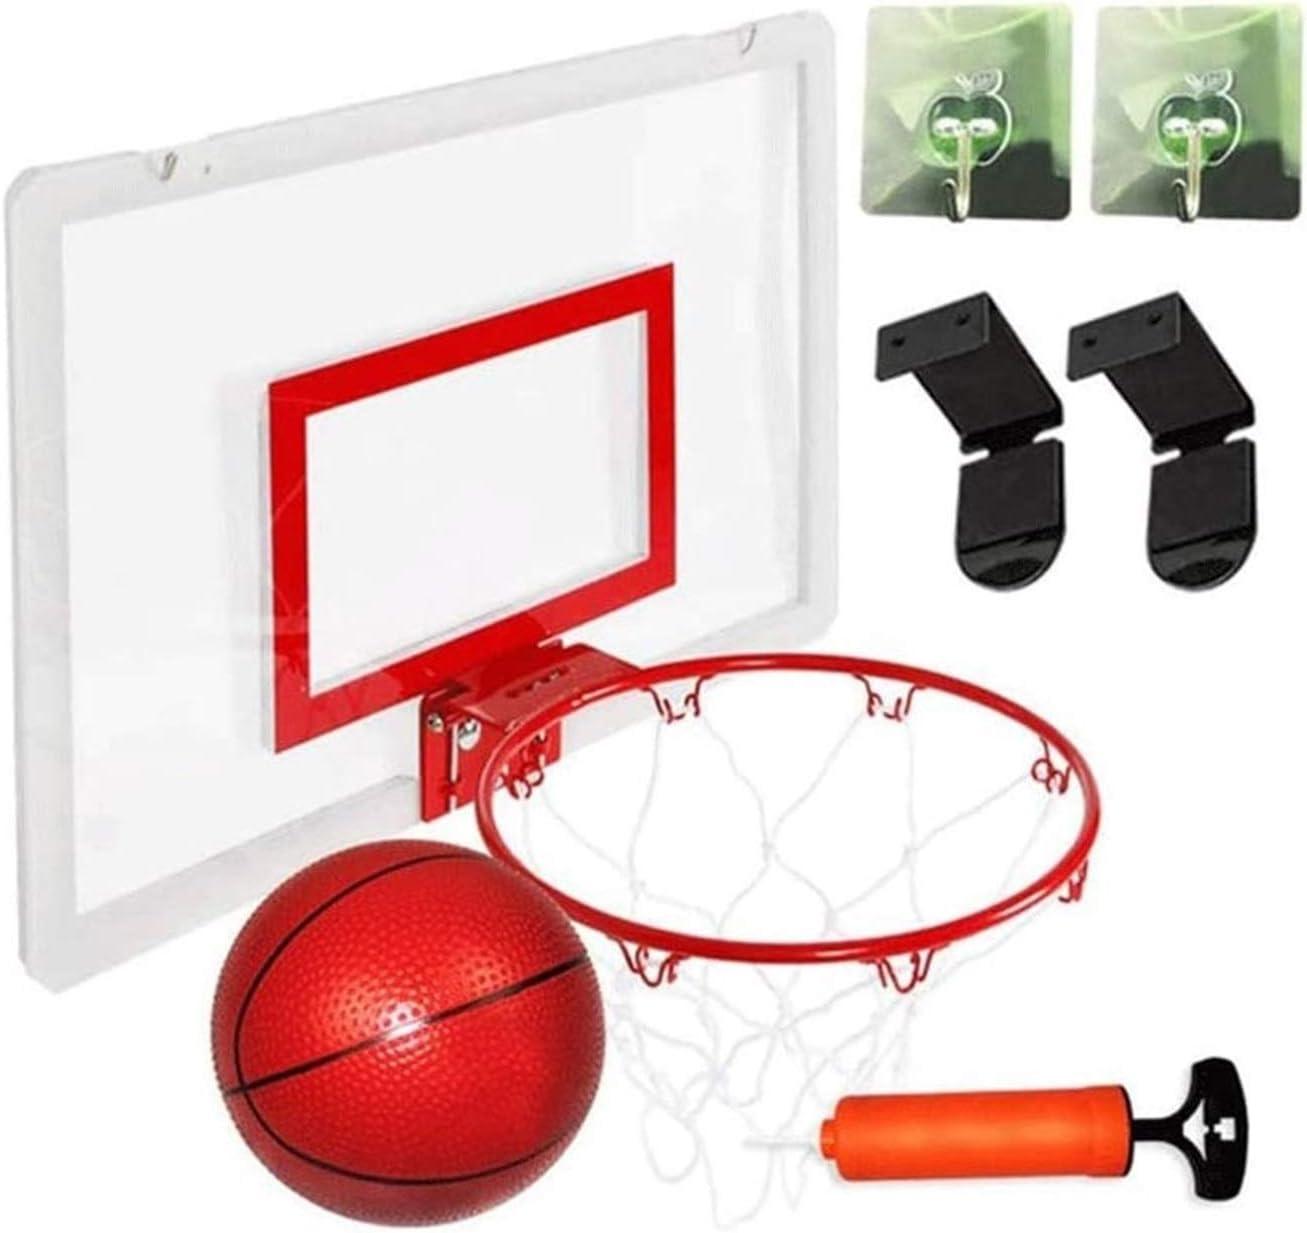 New item SMLZV Basketball Wall-Mount Boards Indoor SALENEW very popular! Children's Punch-Free